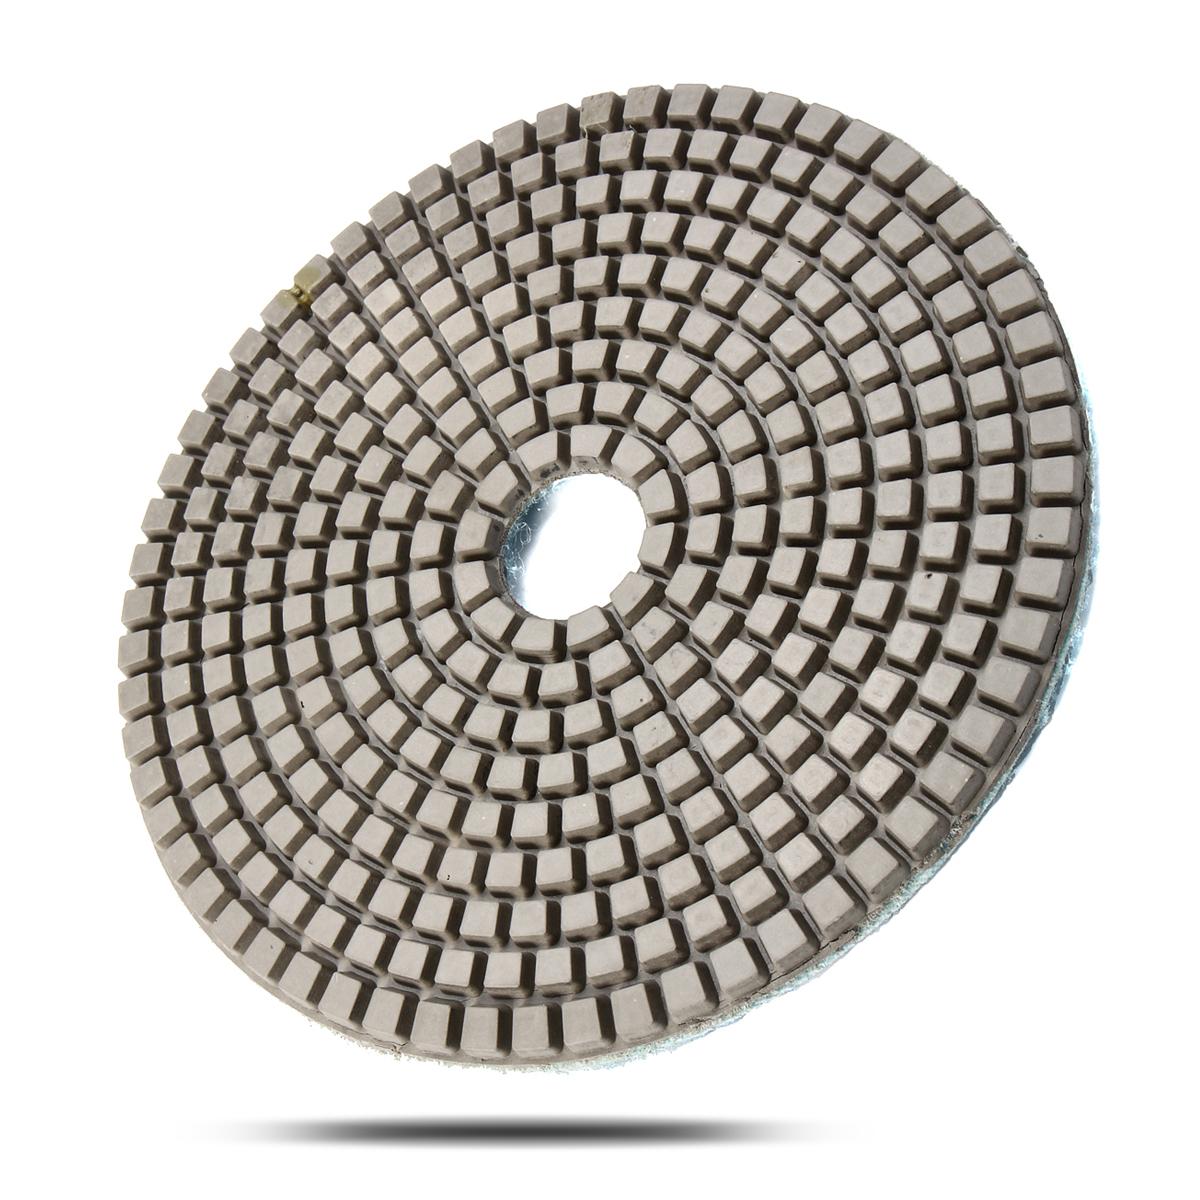 5 Inch Diamond Polishing Pads Wet Dry Sanding Disc Marble